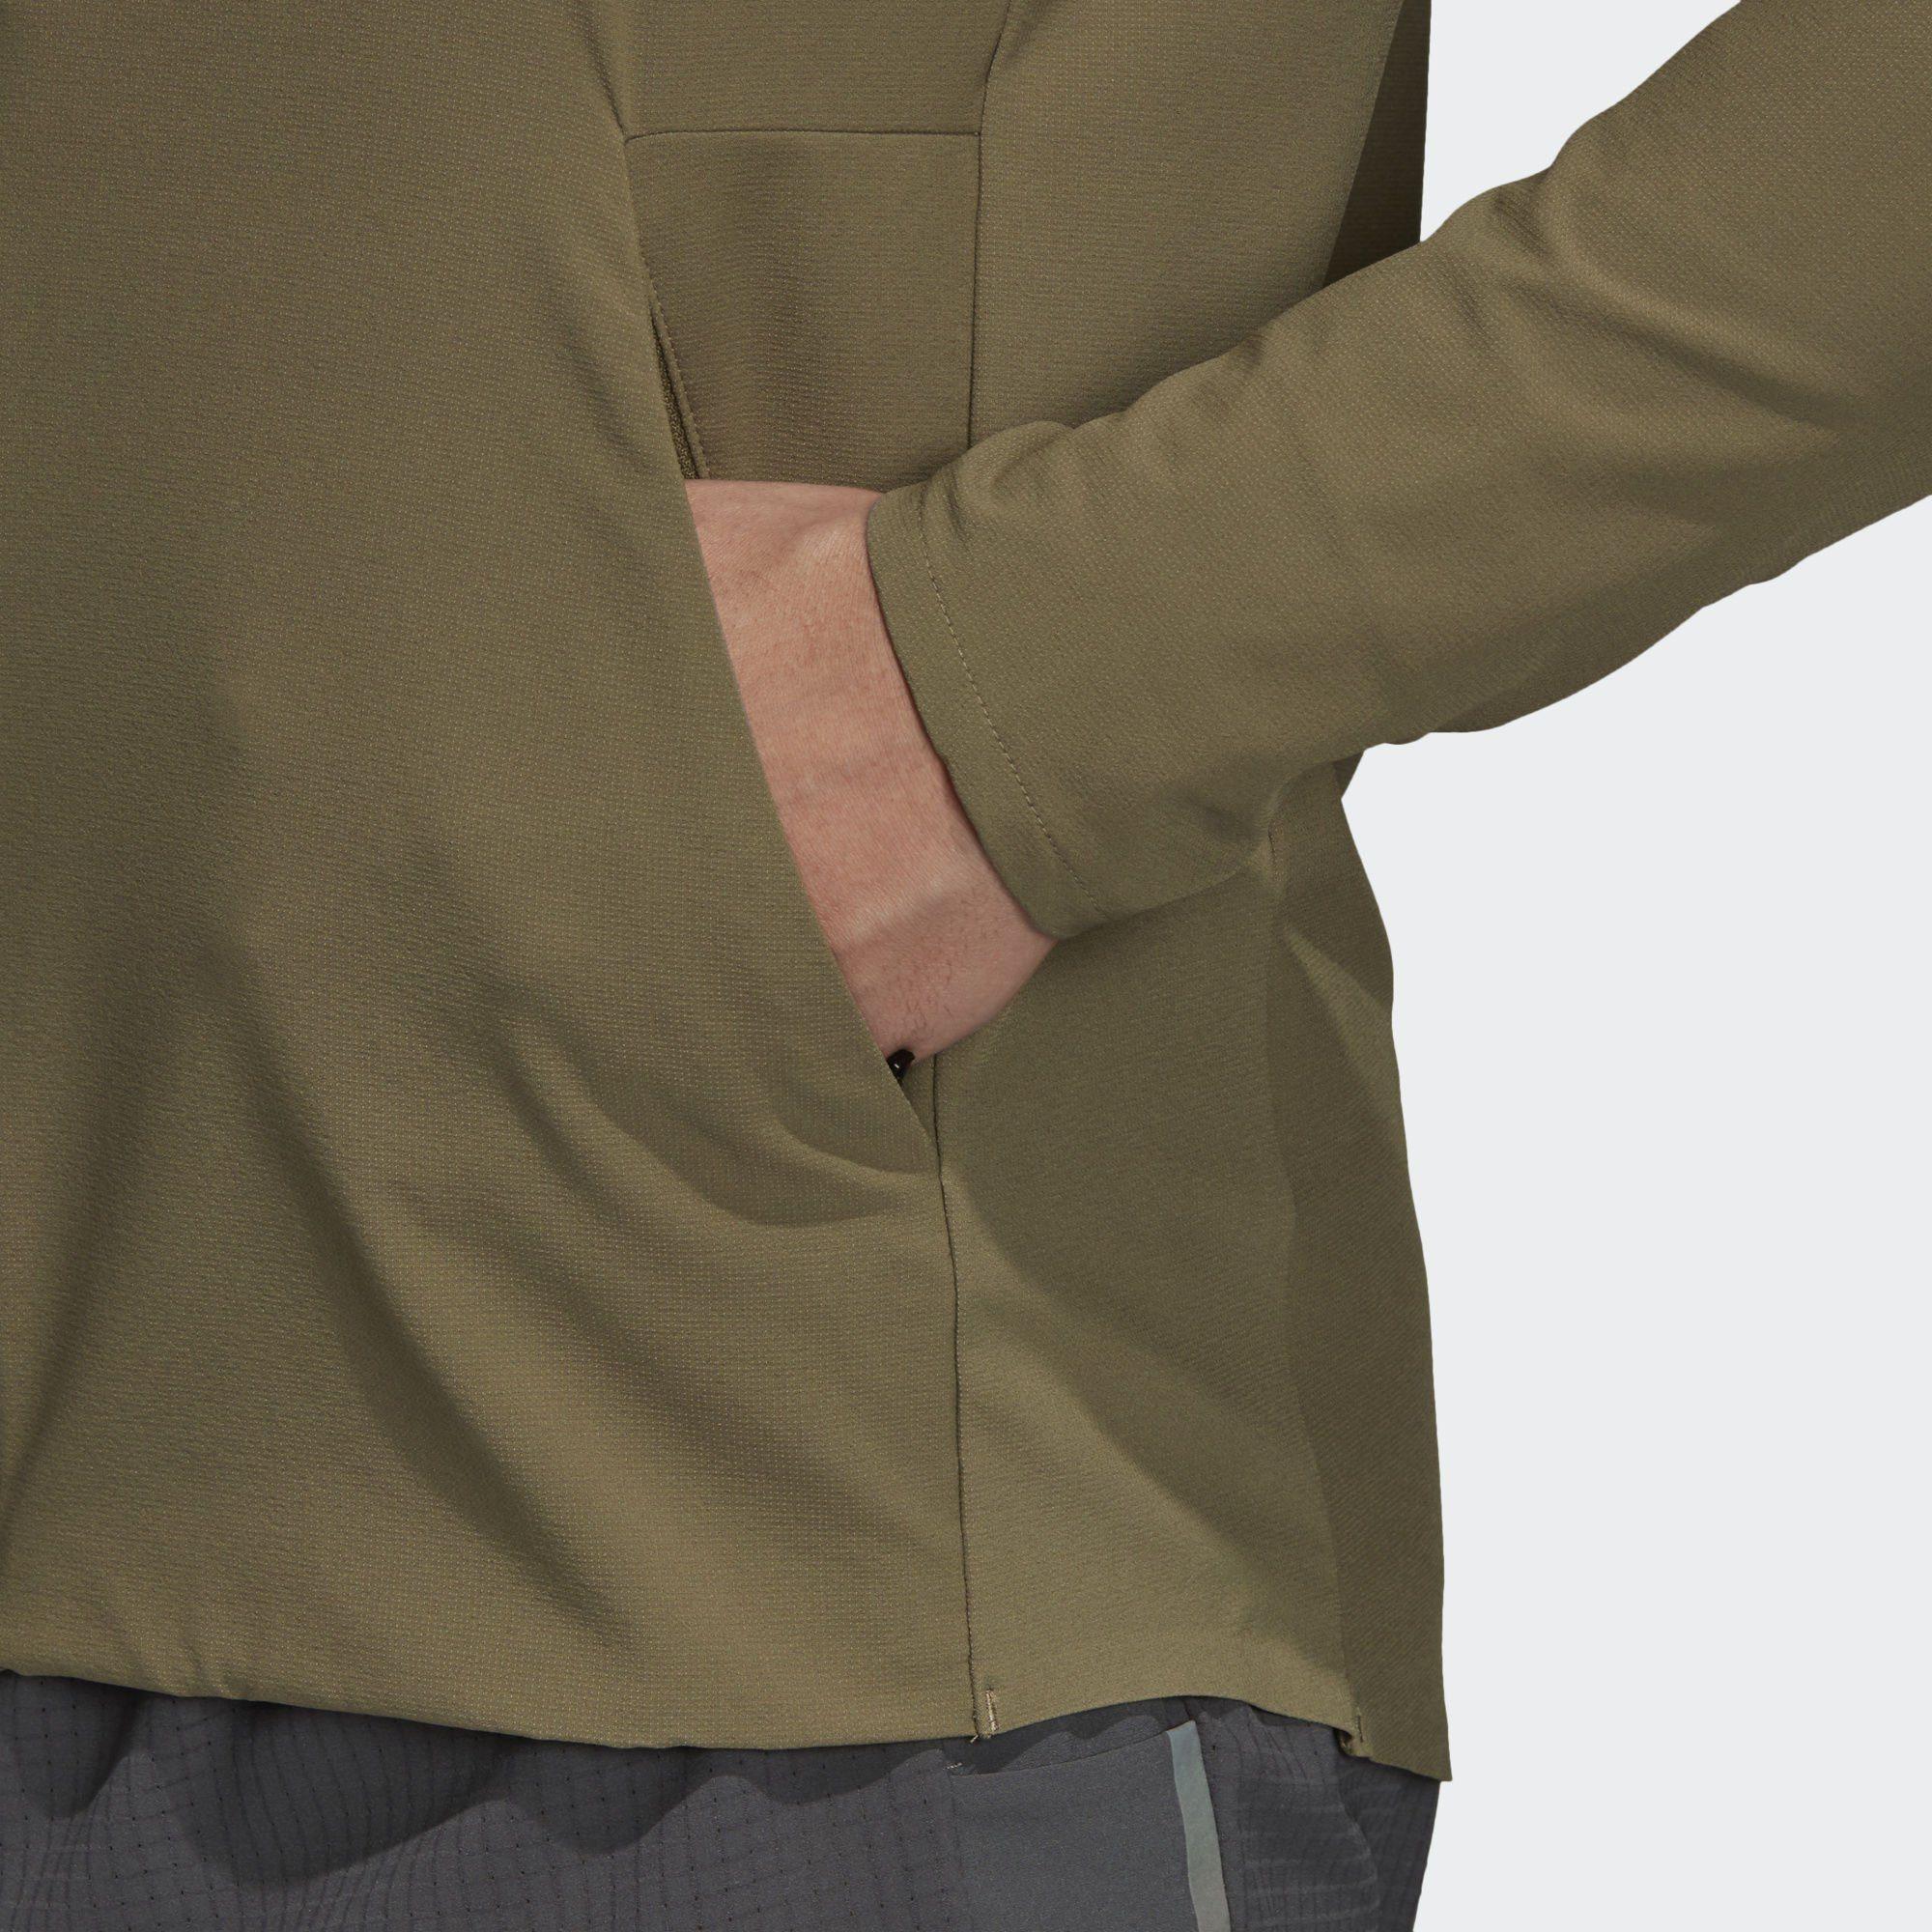 Performance Jacke« Kaufen Z n Online eRun Adidas Regenjacke »adidas MqpVSUz